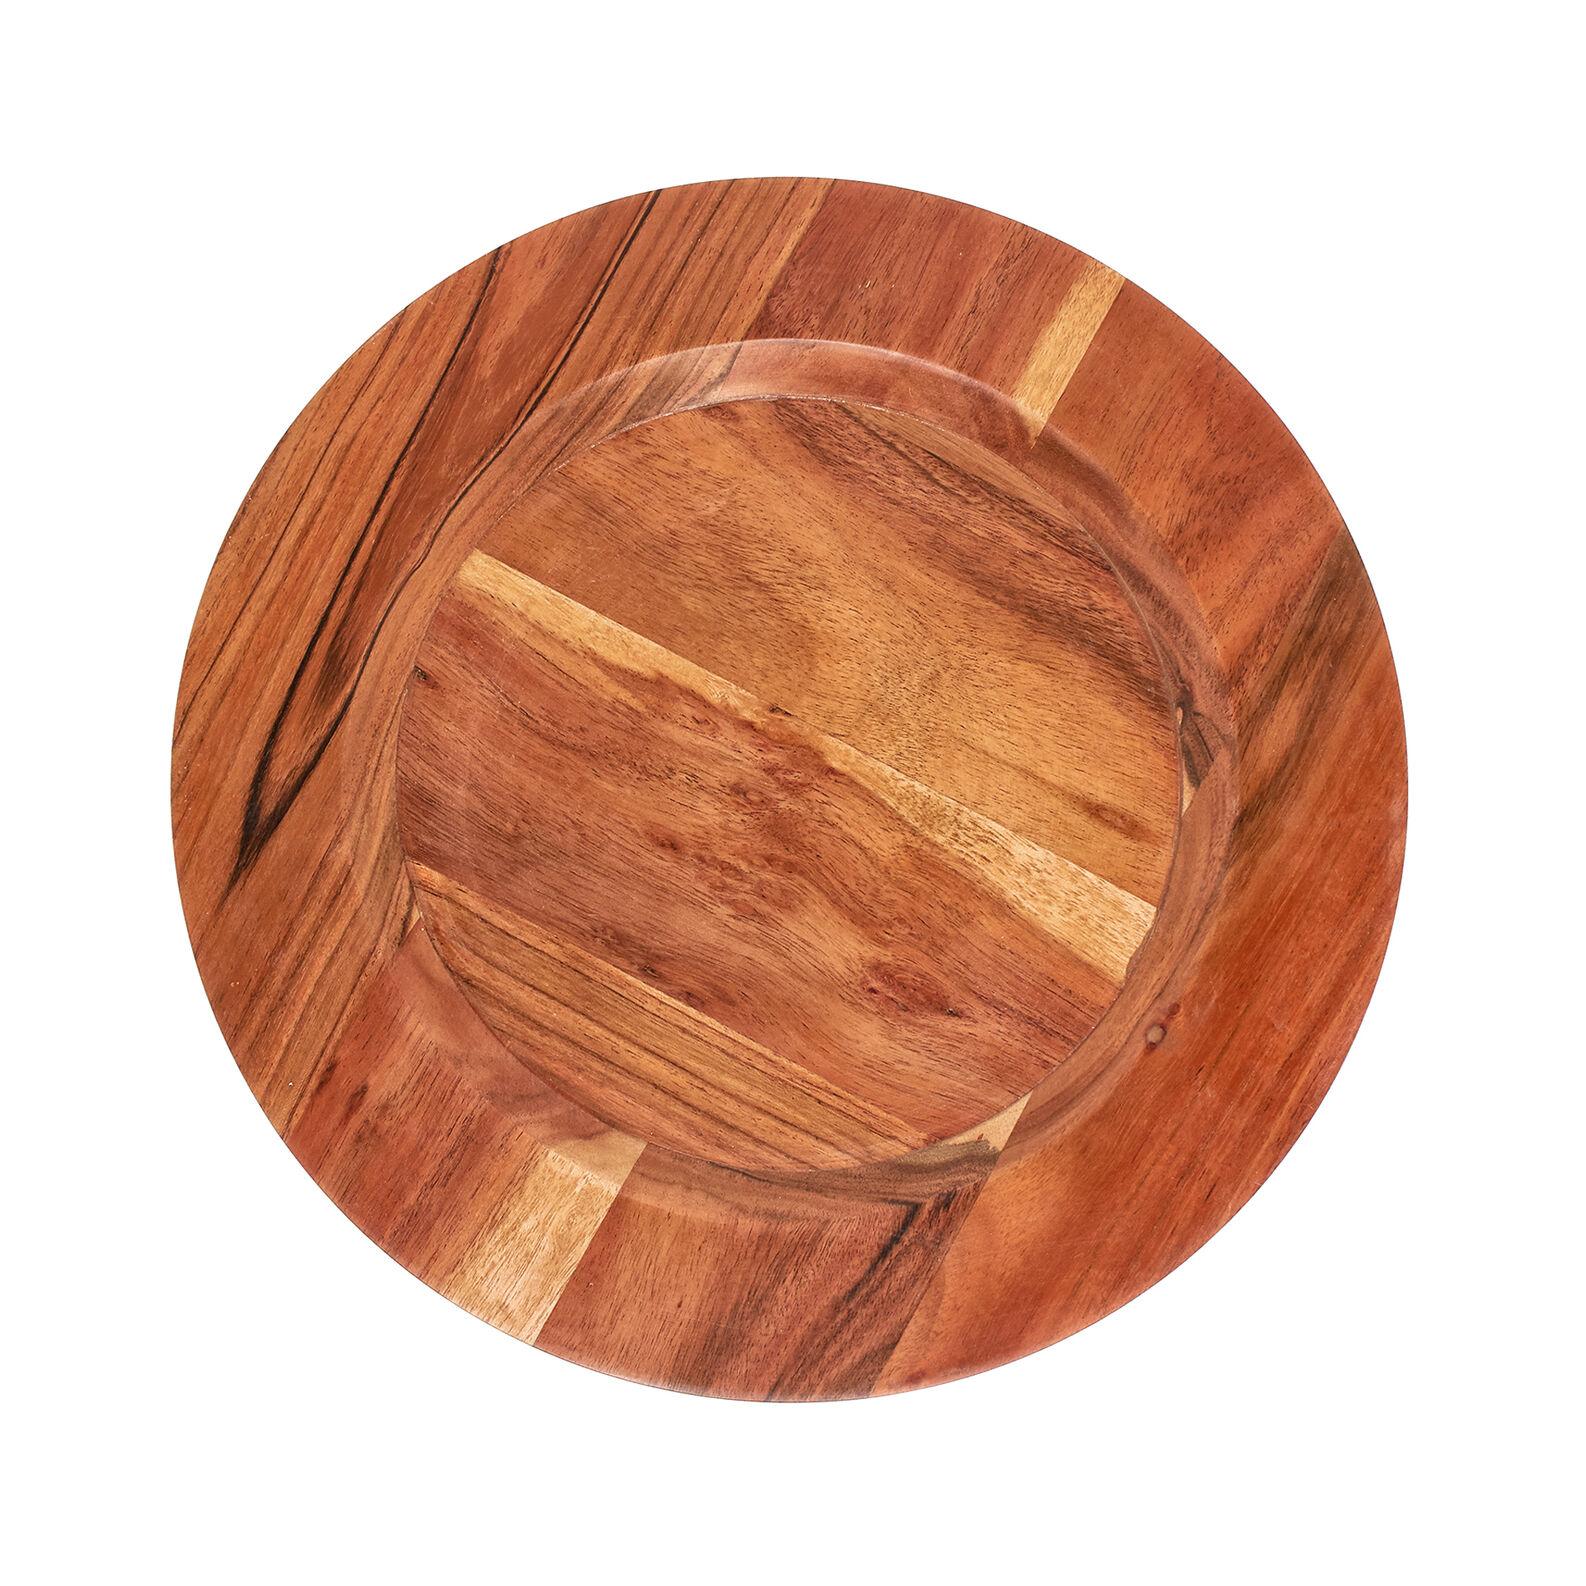 Acacia wood charger plate